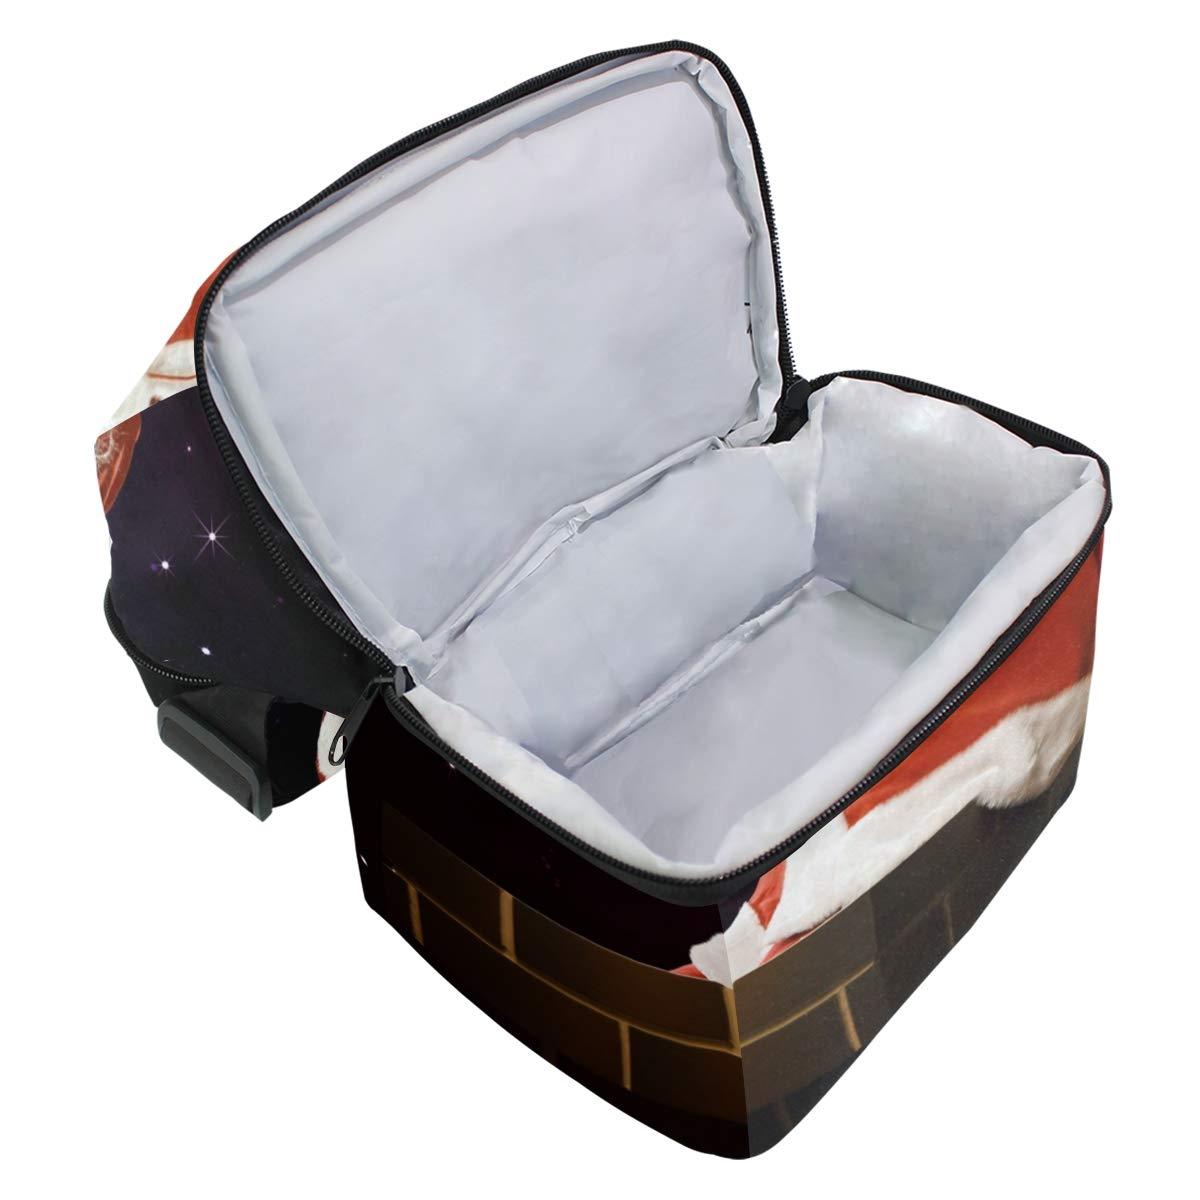 bfd3ad1e70b0 Amazon.com: AISSO Santa Grandfather Gift Bag Frost Lunch Bag ...